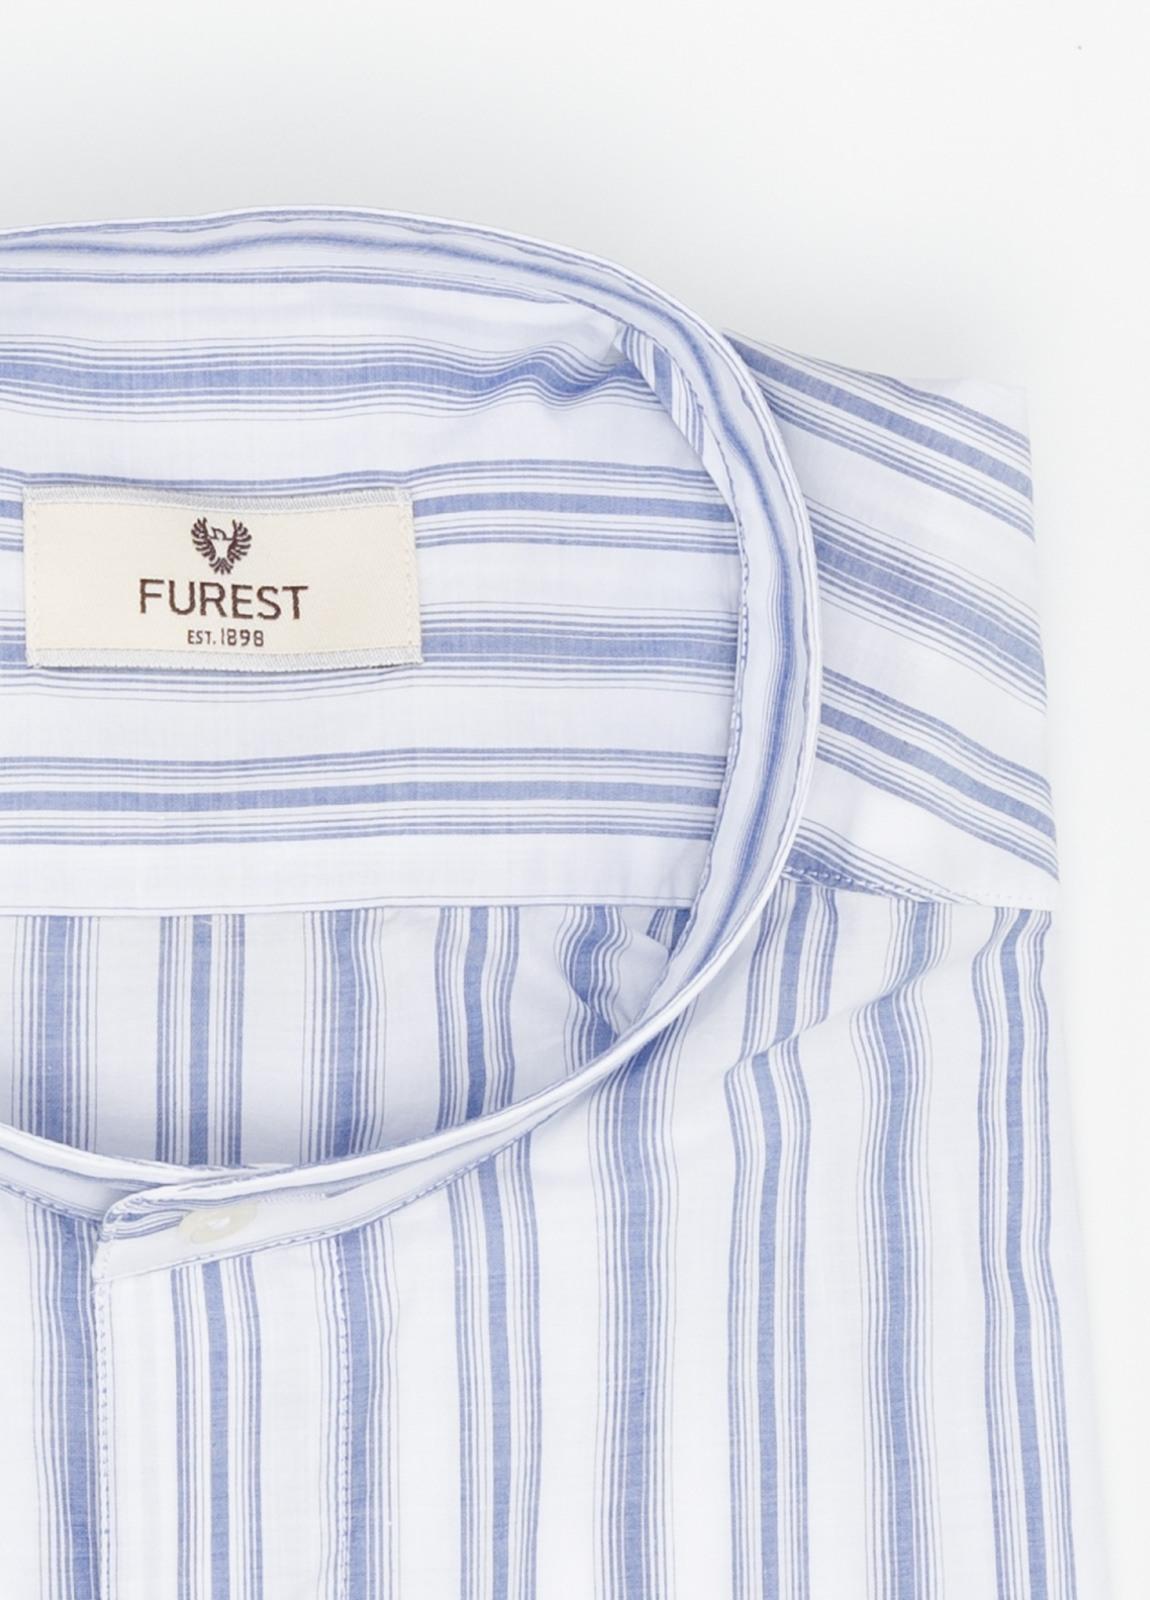 Camisa Leisure Wear SLIM FIT cuello mao. Fondo blanco rayas color azul celeste. 100% Algodón. - Ítem1